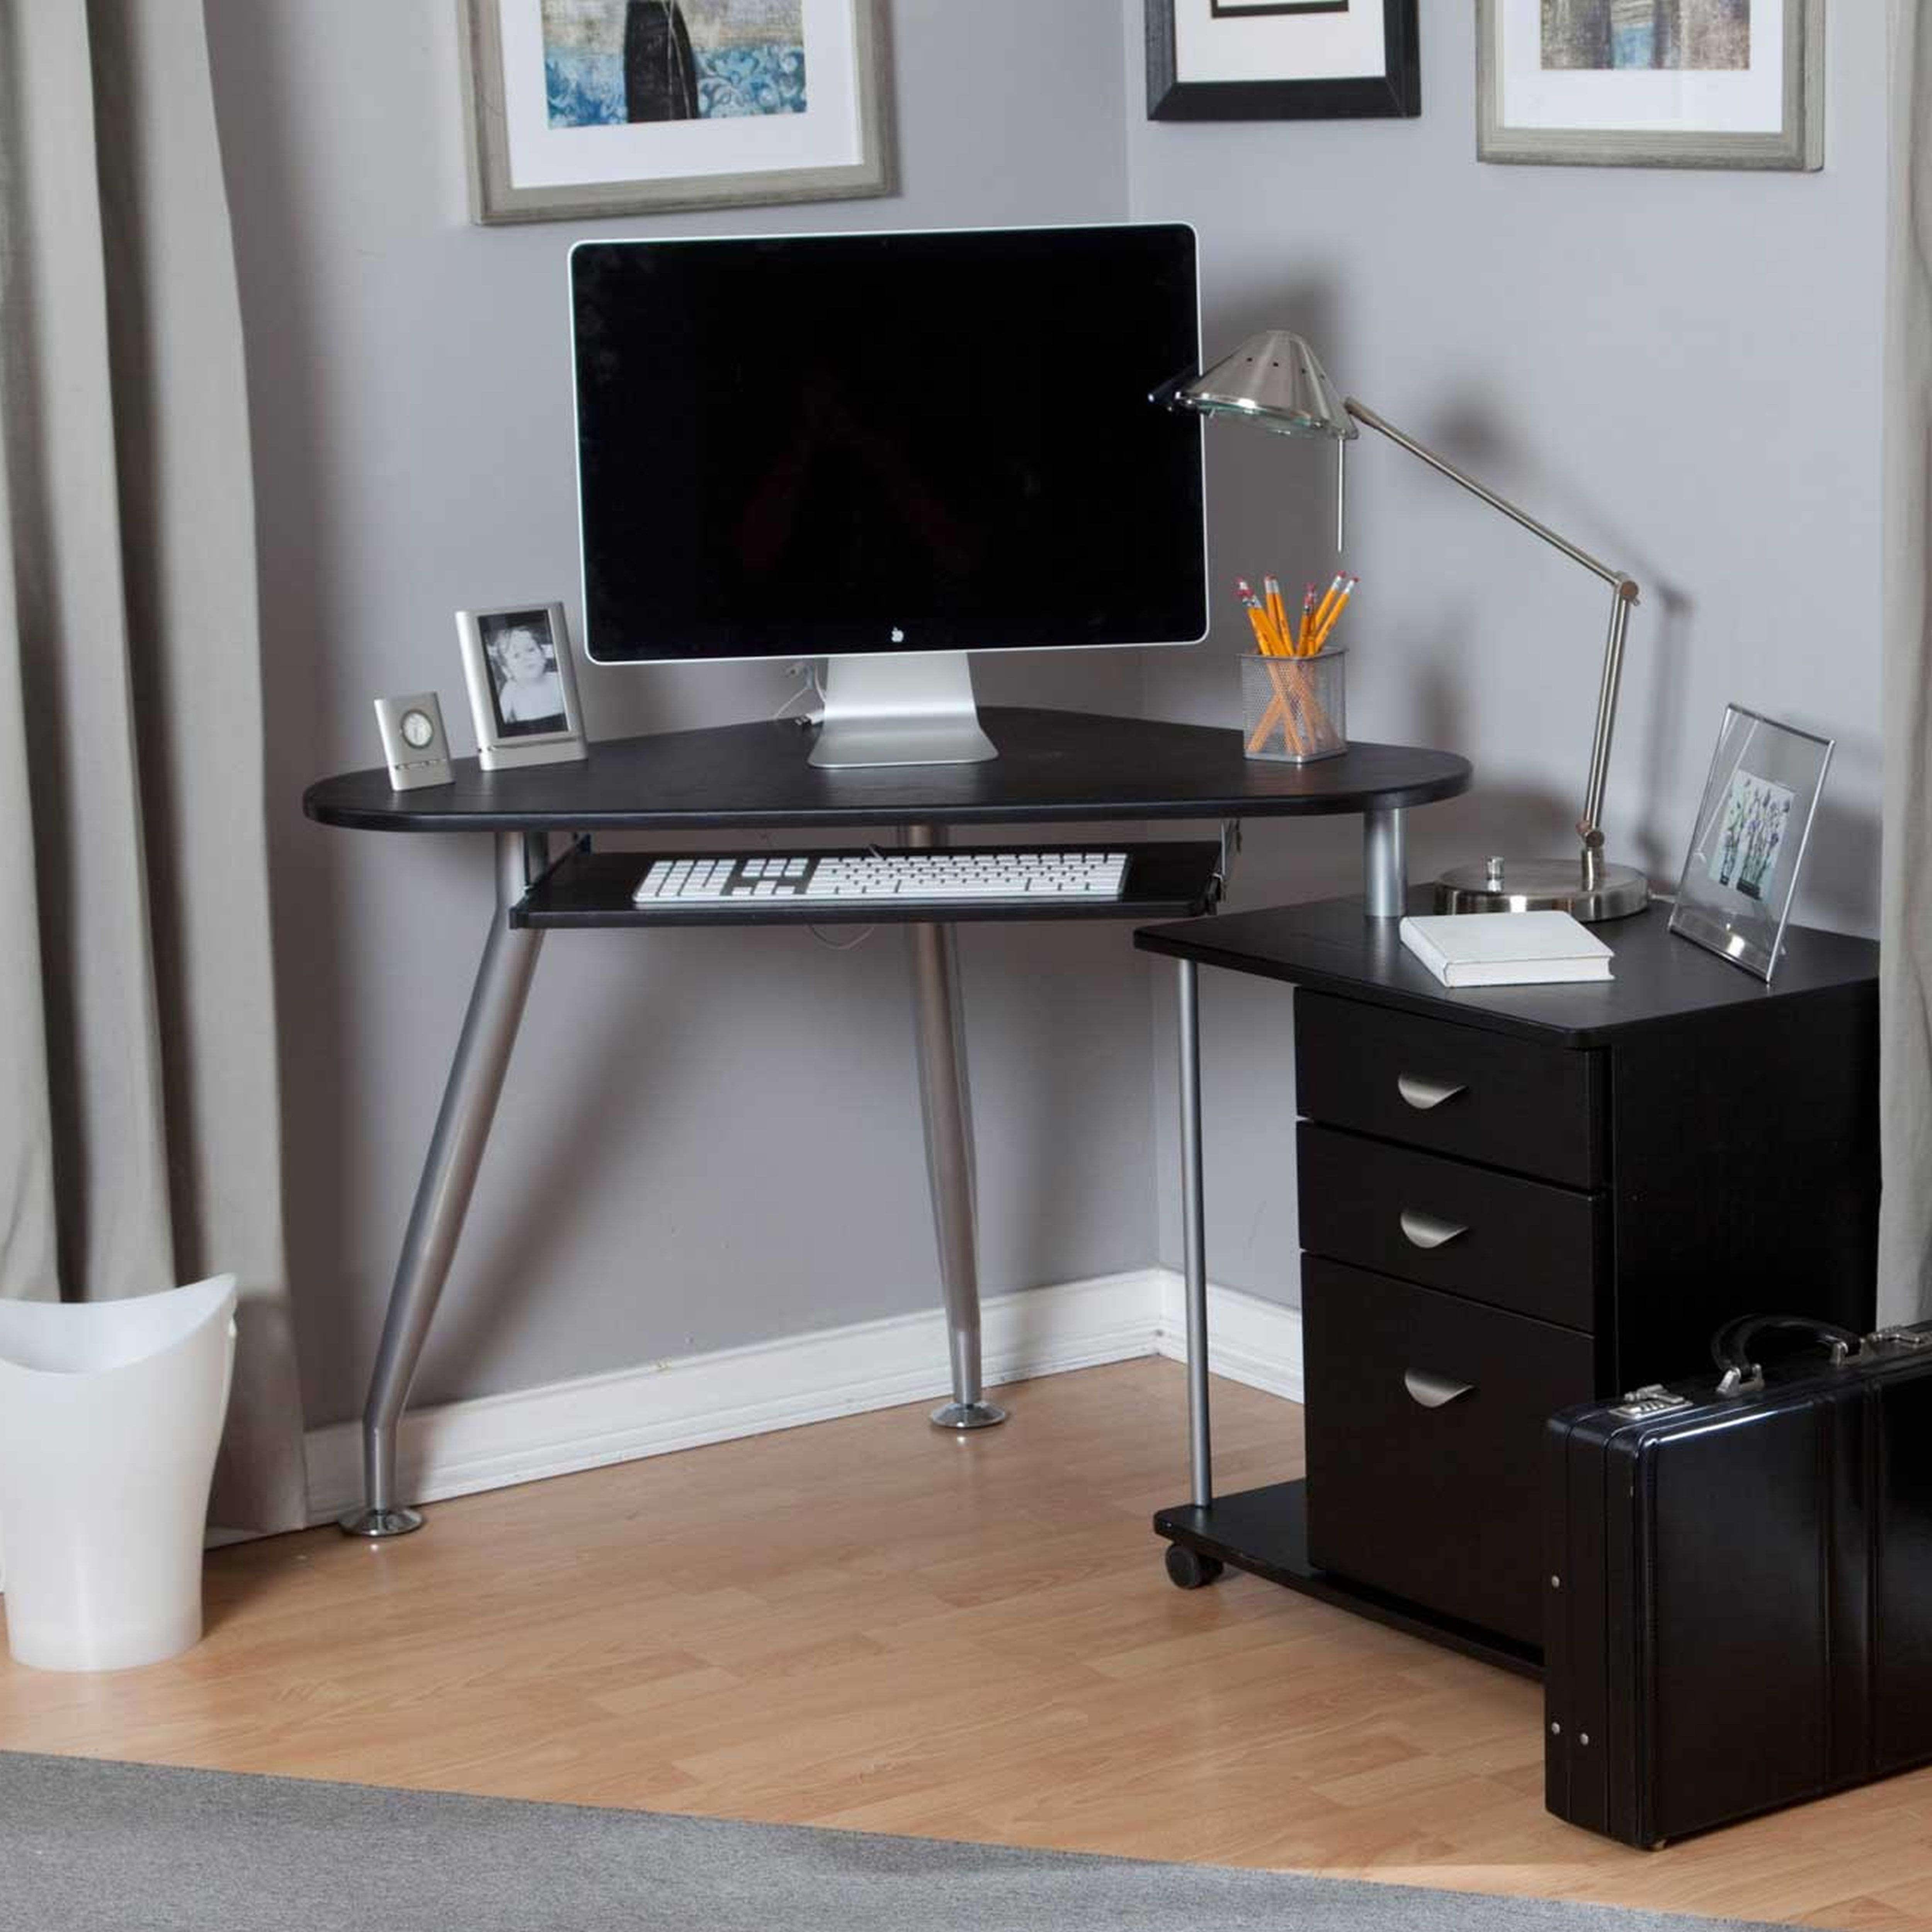 Modern Grey Painted Iron Laminated Small Corner Computer Desk